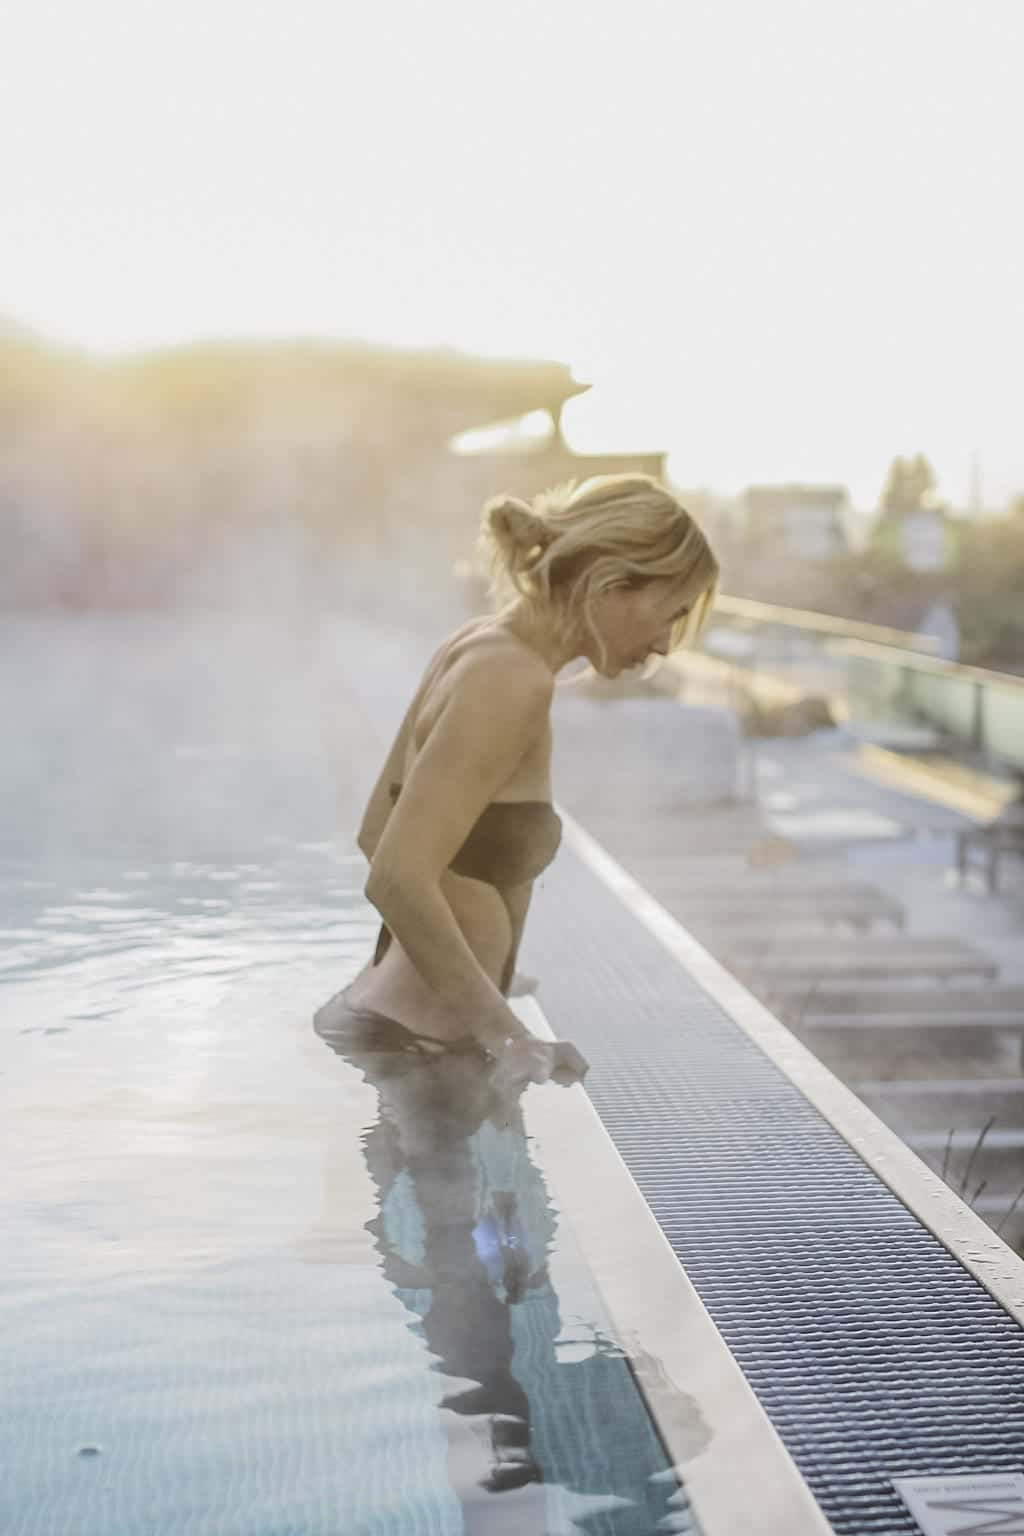 ck-constantlyk-com-karin-kaswurm-wellness-spa-hotel-gmachl-salzburg-3719